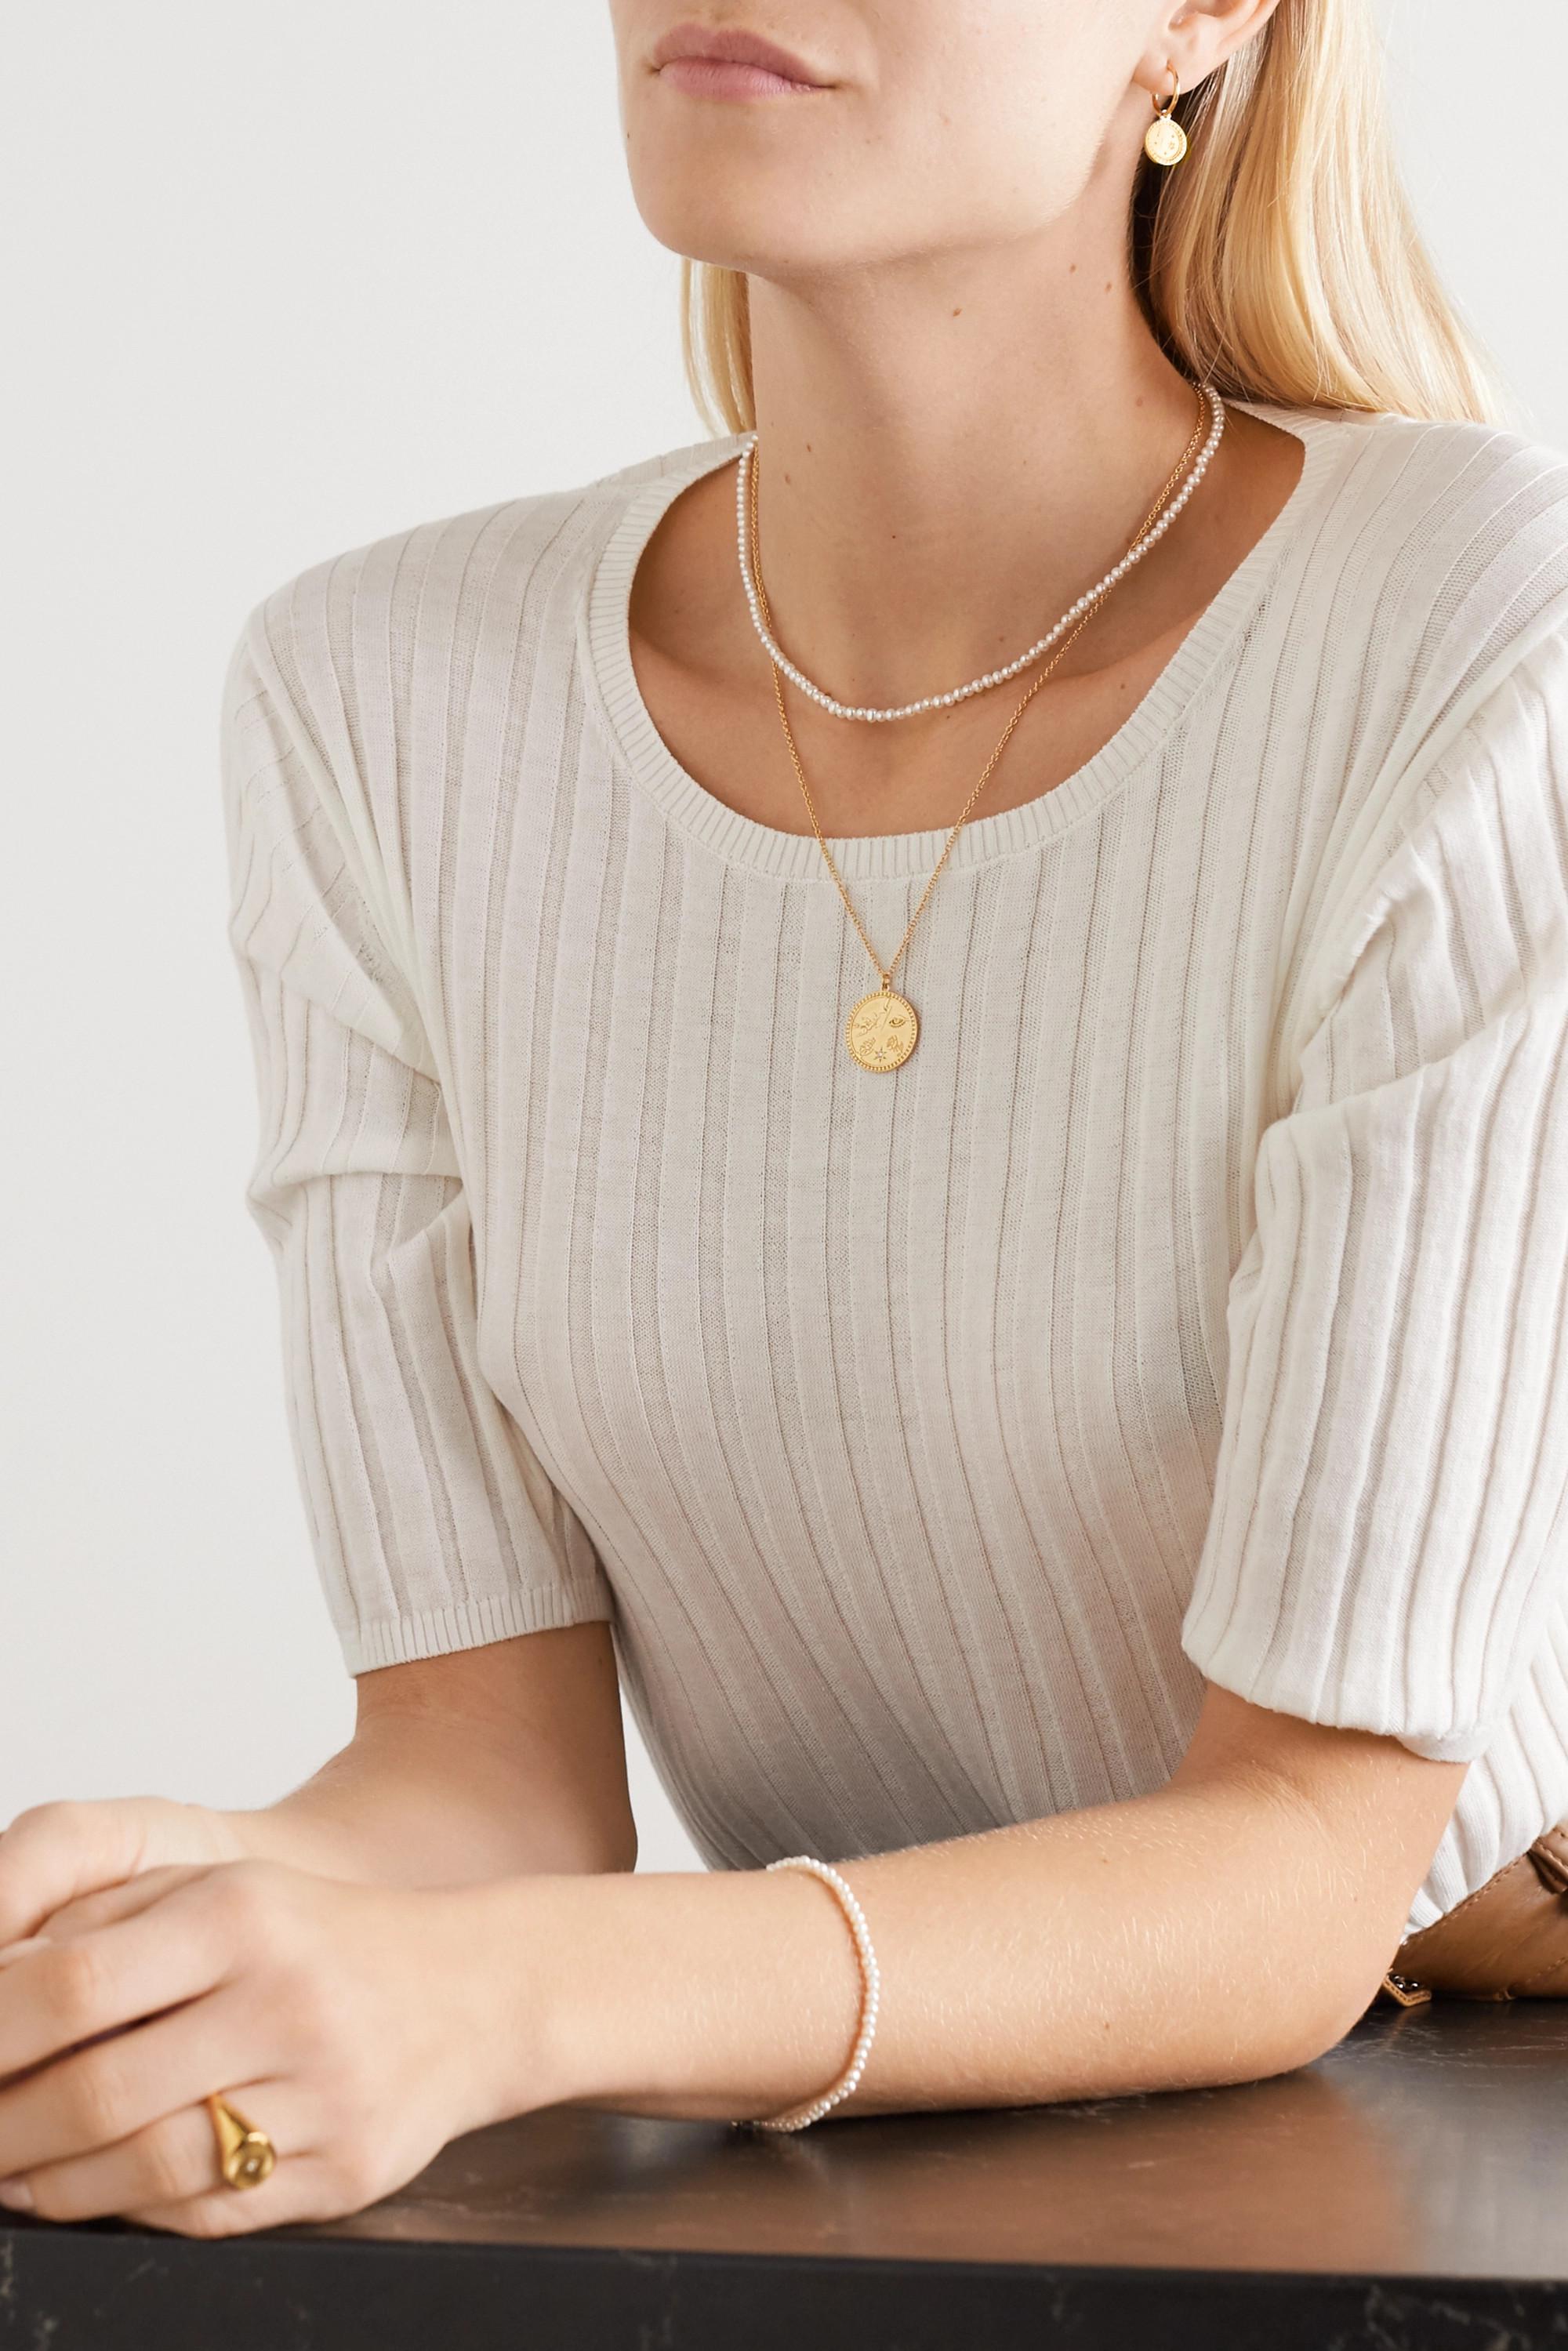 Meadowlark Talisman gold-plated diamond necklace